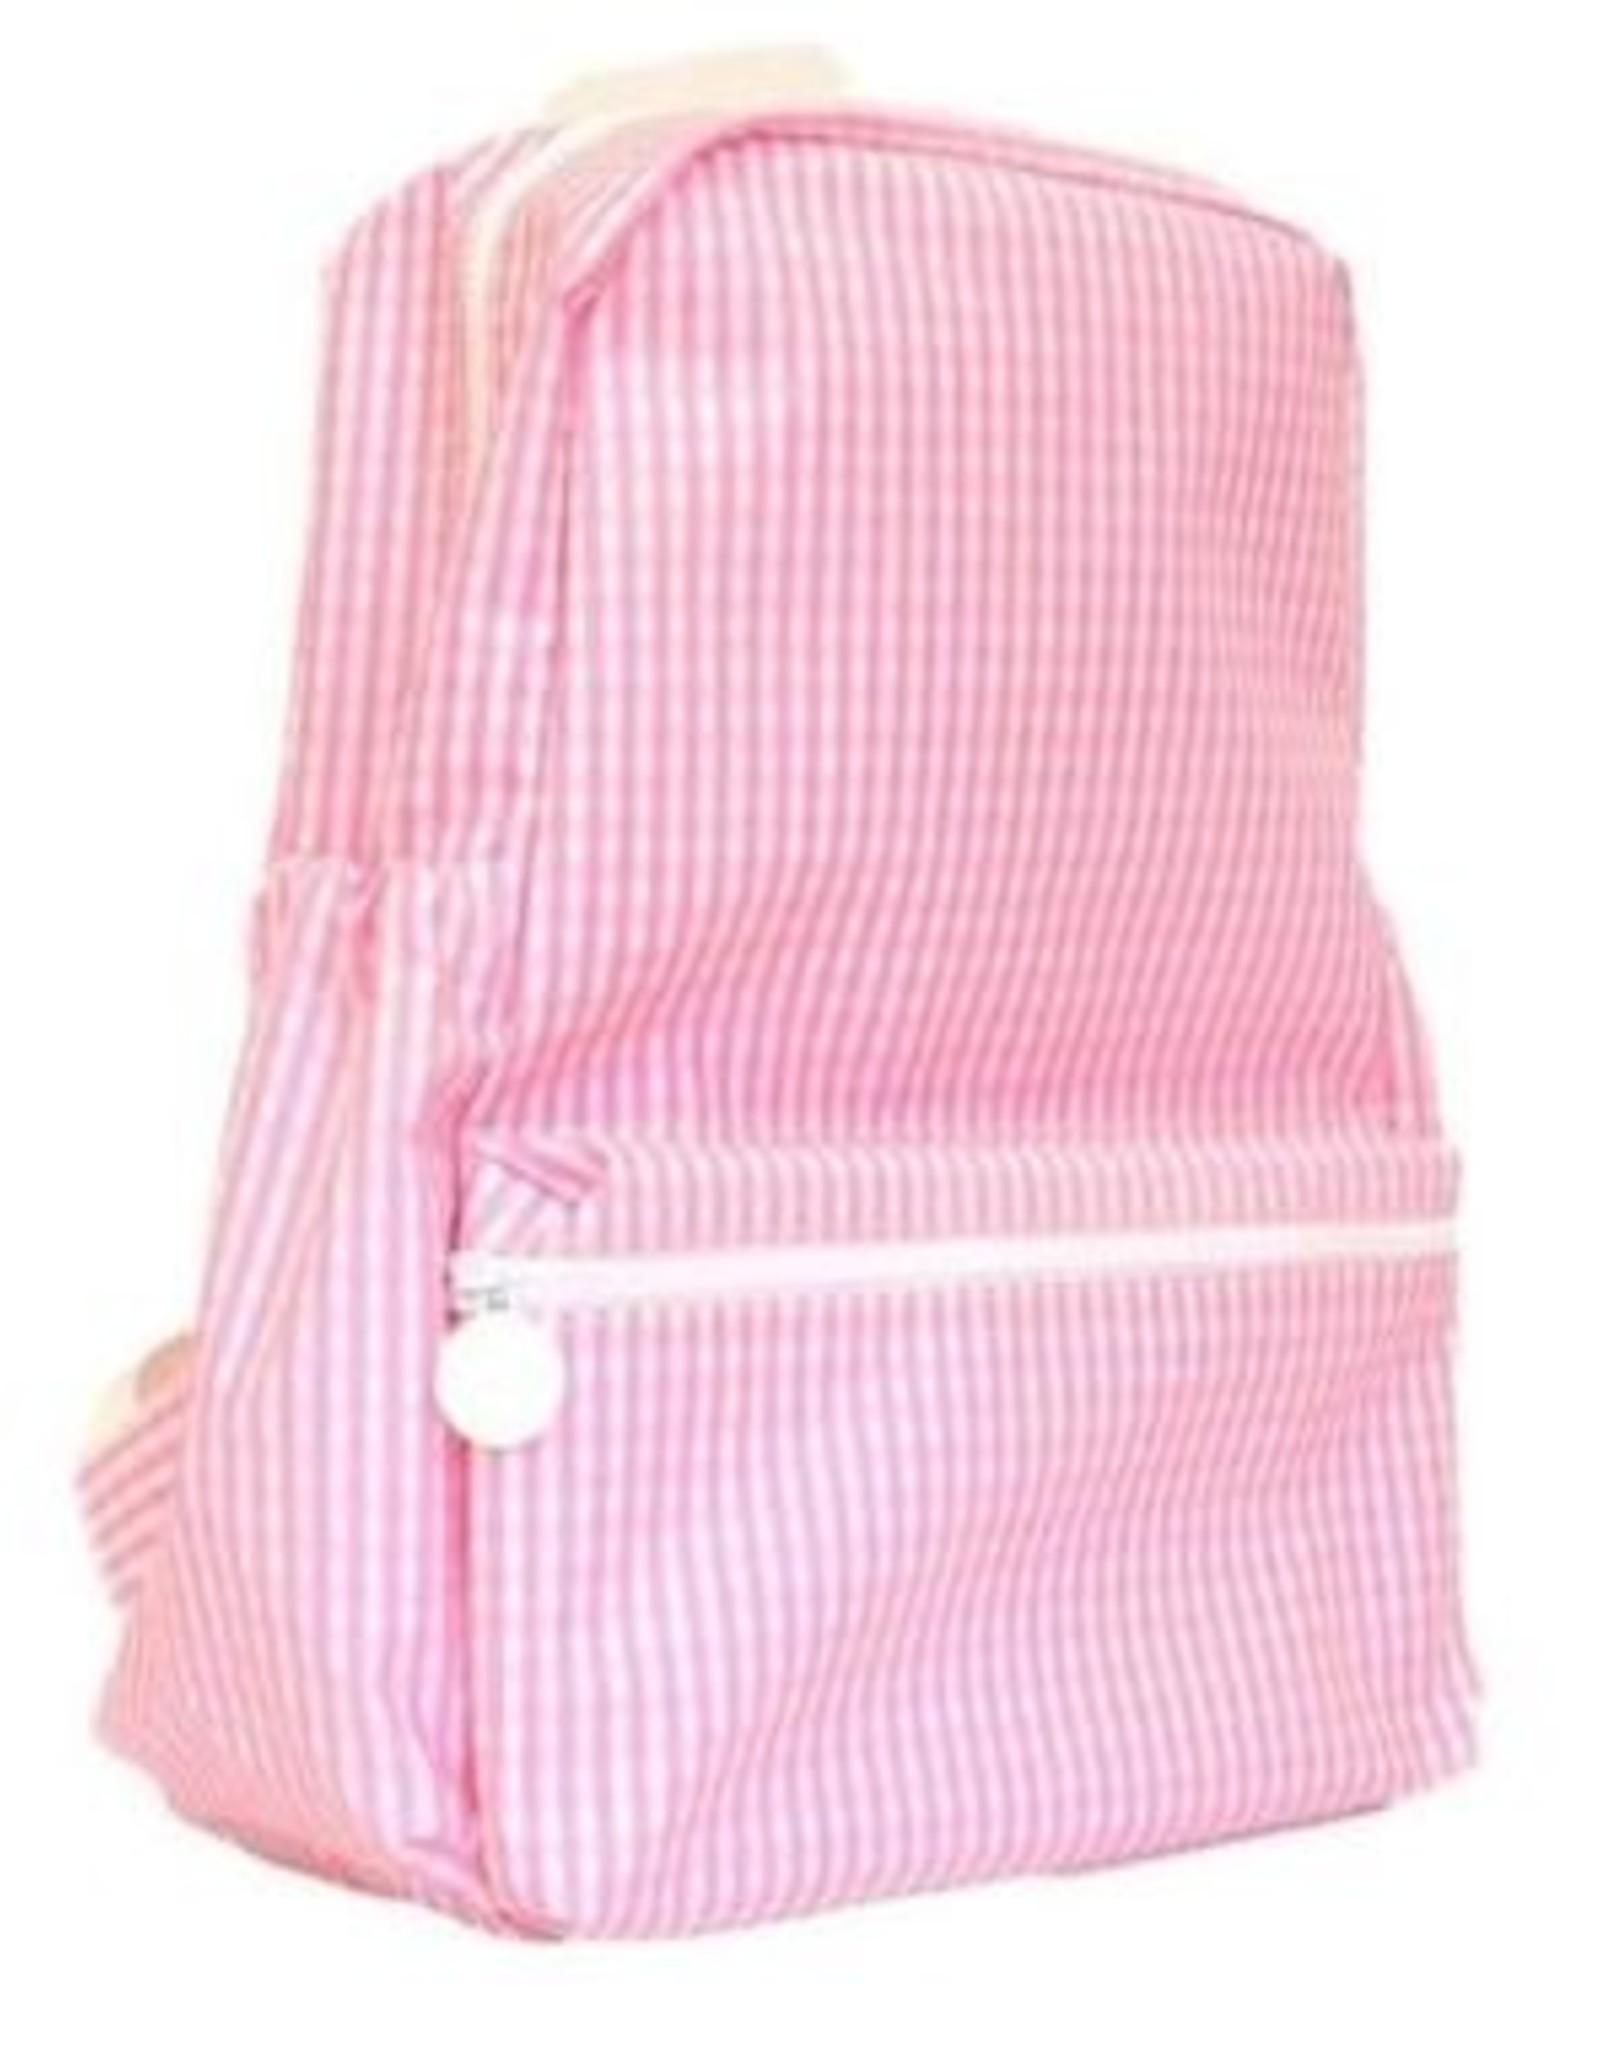 TRVL Design Backpacker Backpack